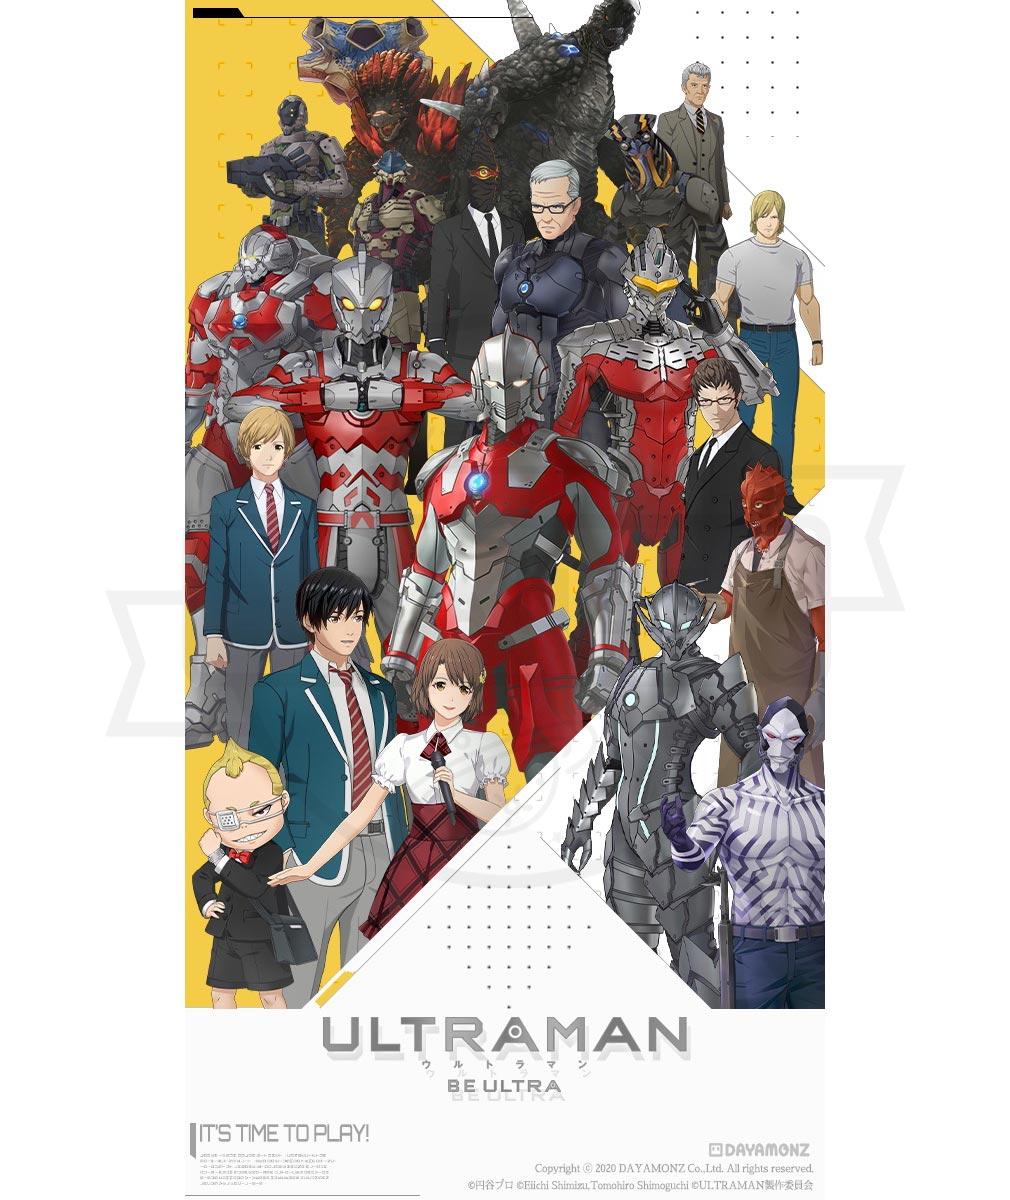 ULTRAMAN BE ULTRA(ウルトラマン) キービジュアル